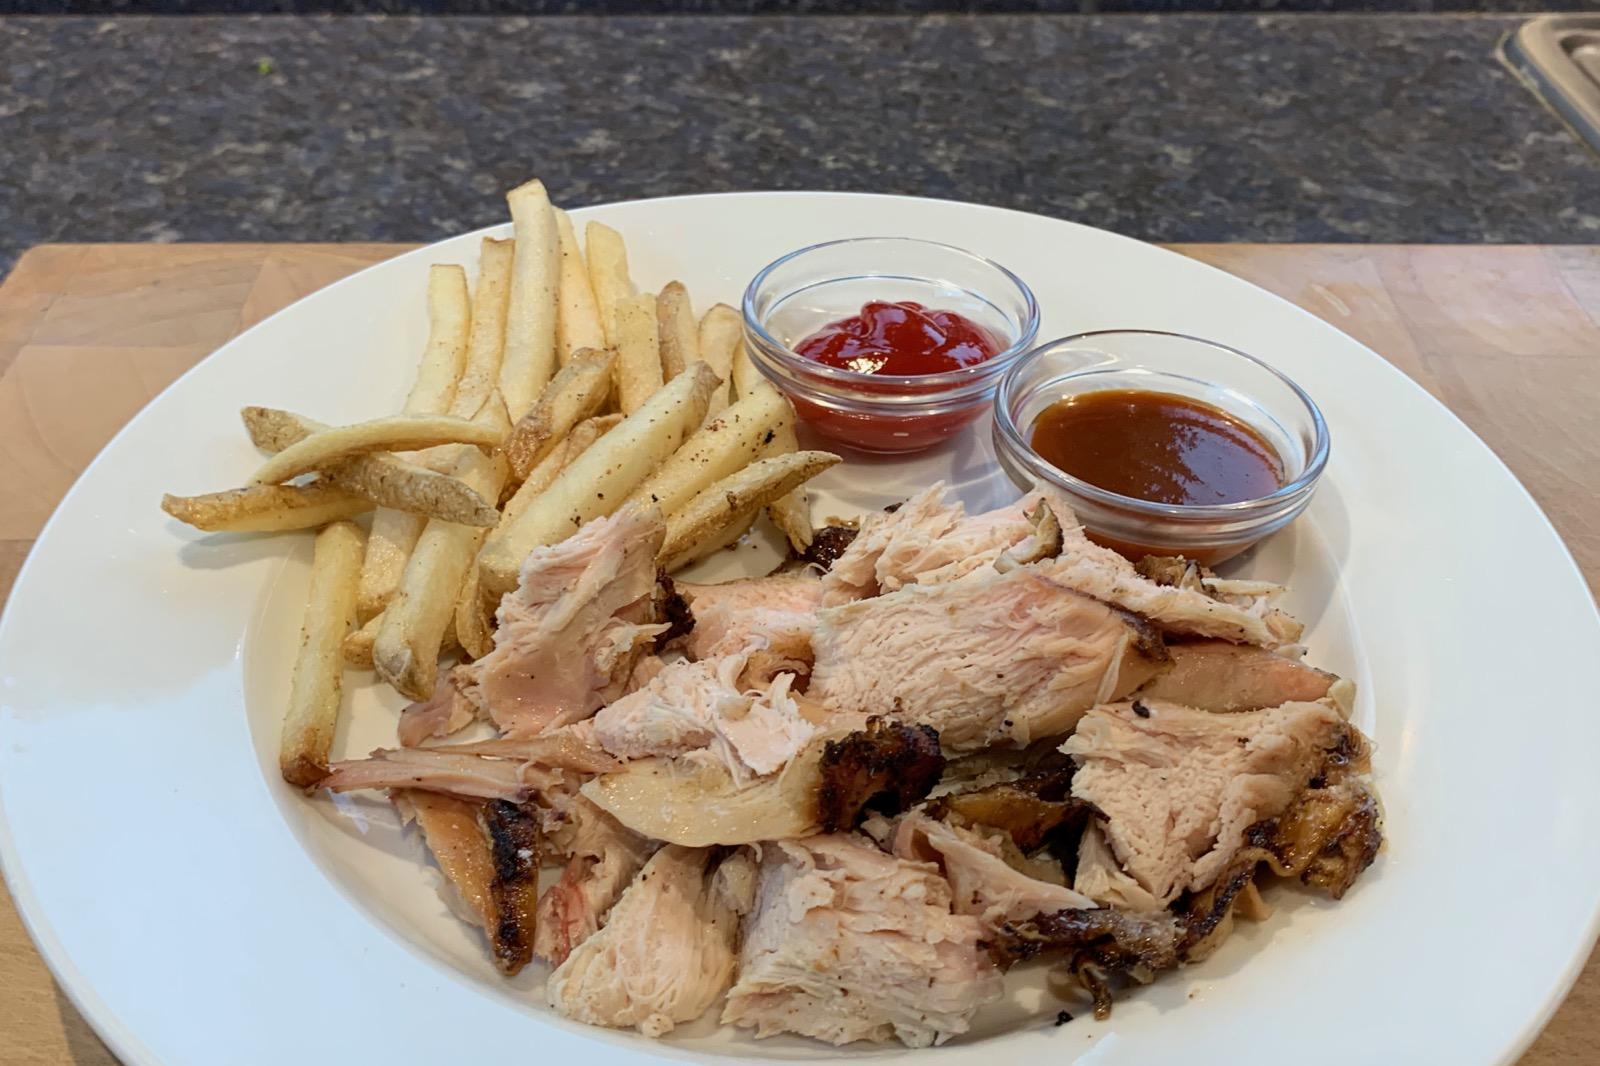 http://blog.rickk.com/food/2020/03/11/ate.2020.03.10.d.jpg